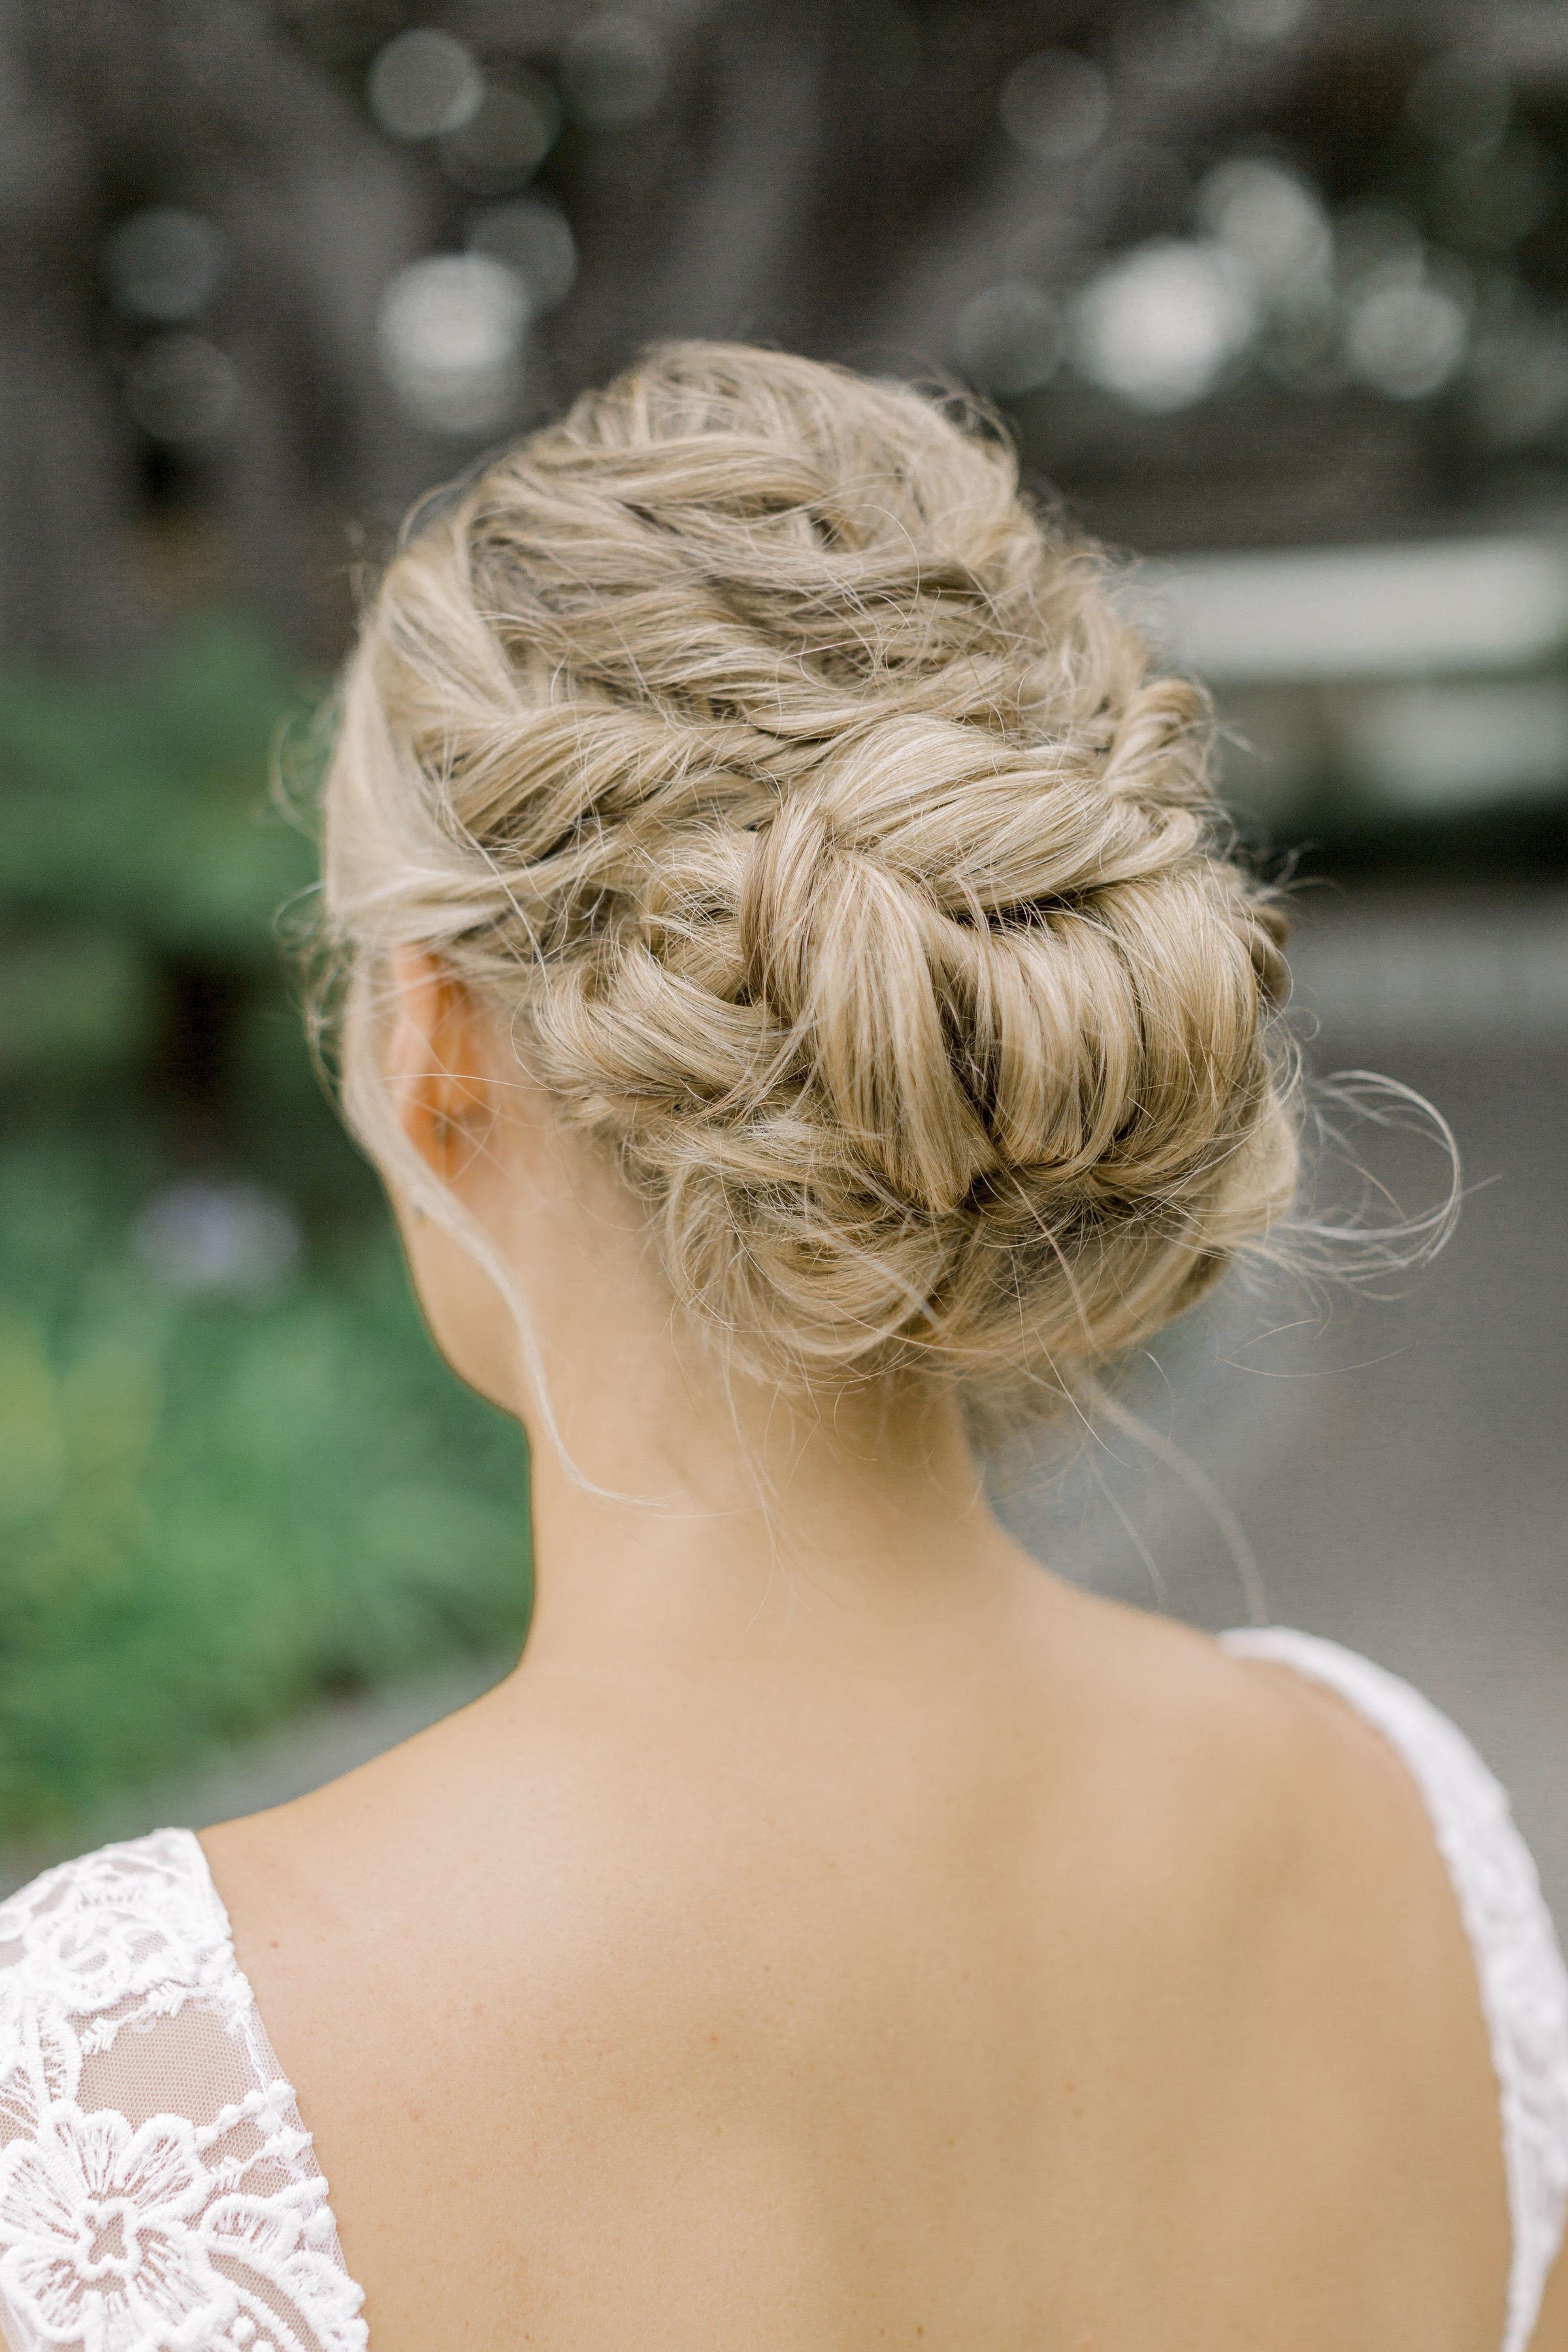 Domenica Beauty _ Hair and Makeup Artist _Wedding _ Santa Monica, CA _ Carey and Nick _ 18.JPG